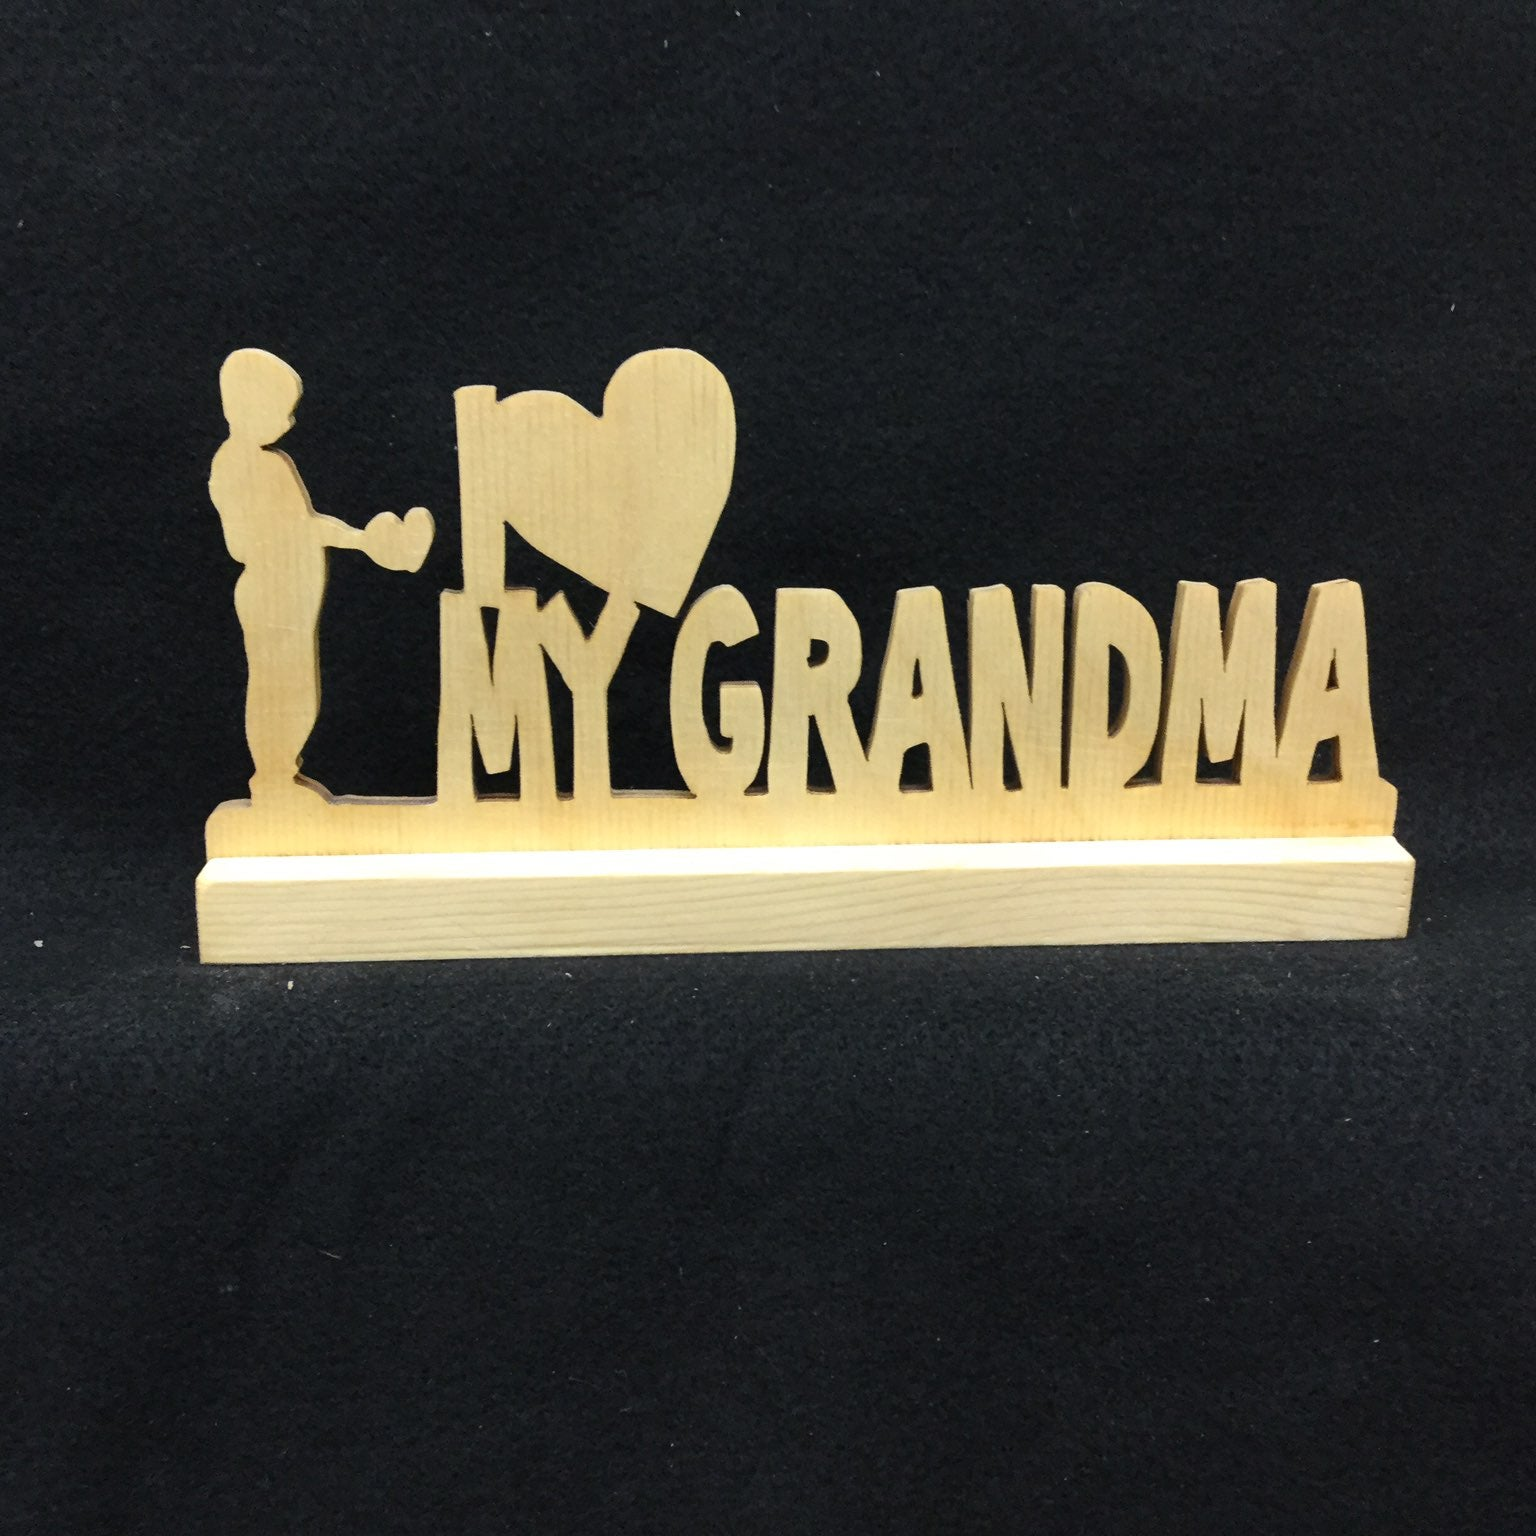 I Love Grandma 'boy'